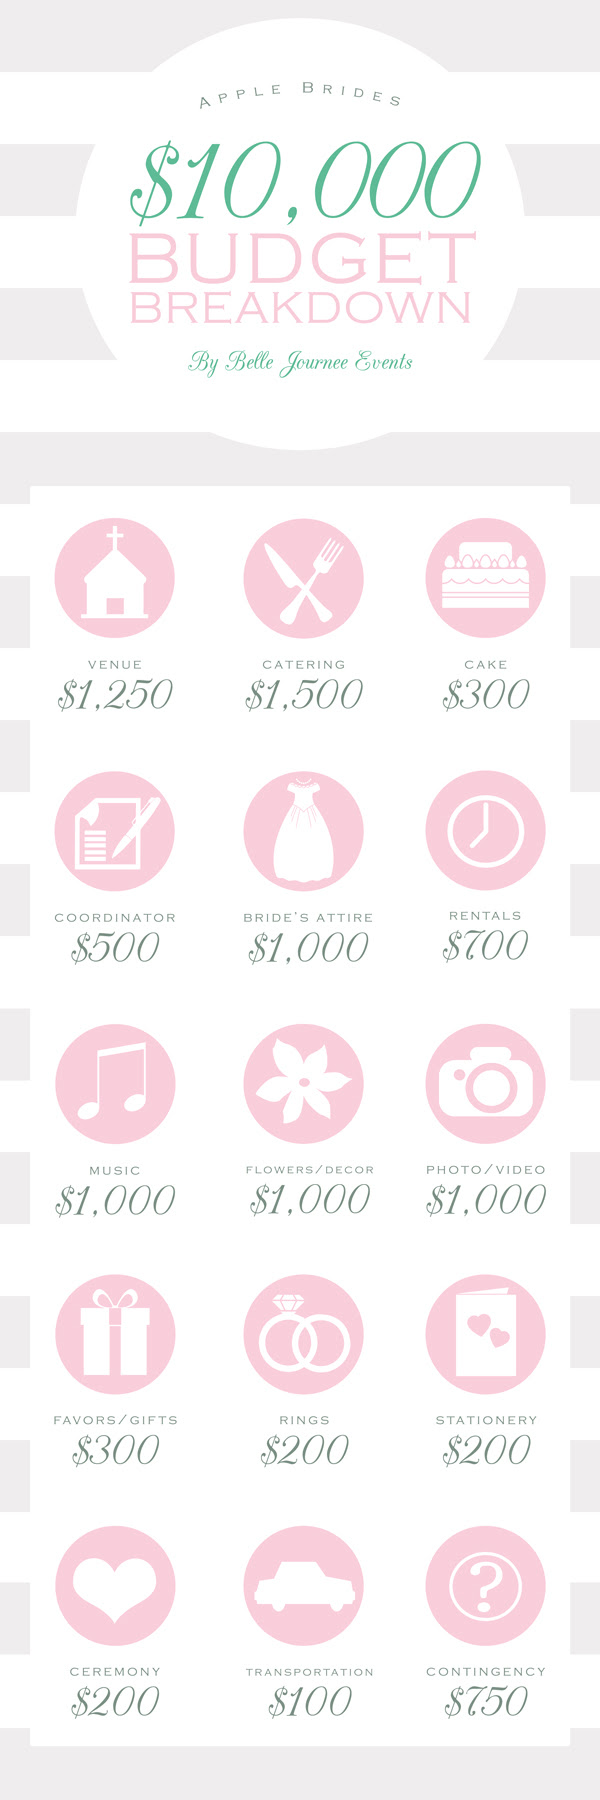 Wedding 10 000 Budget